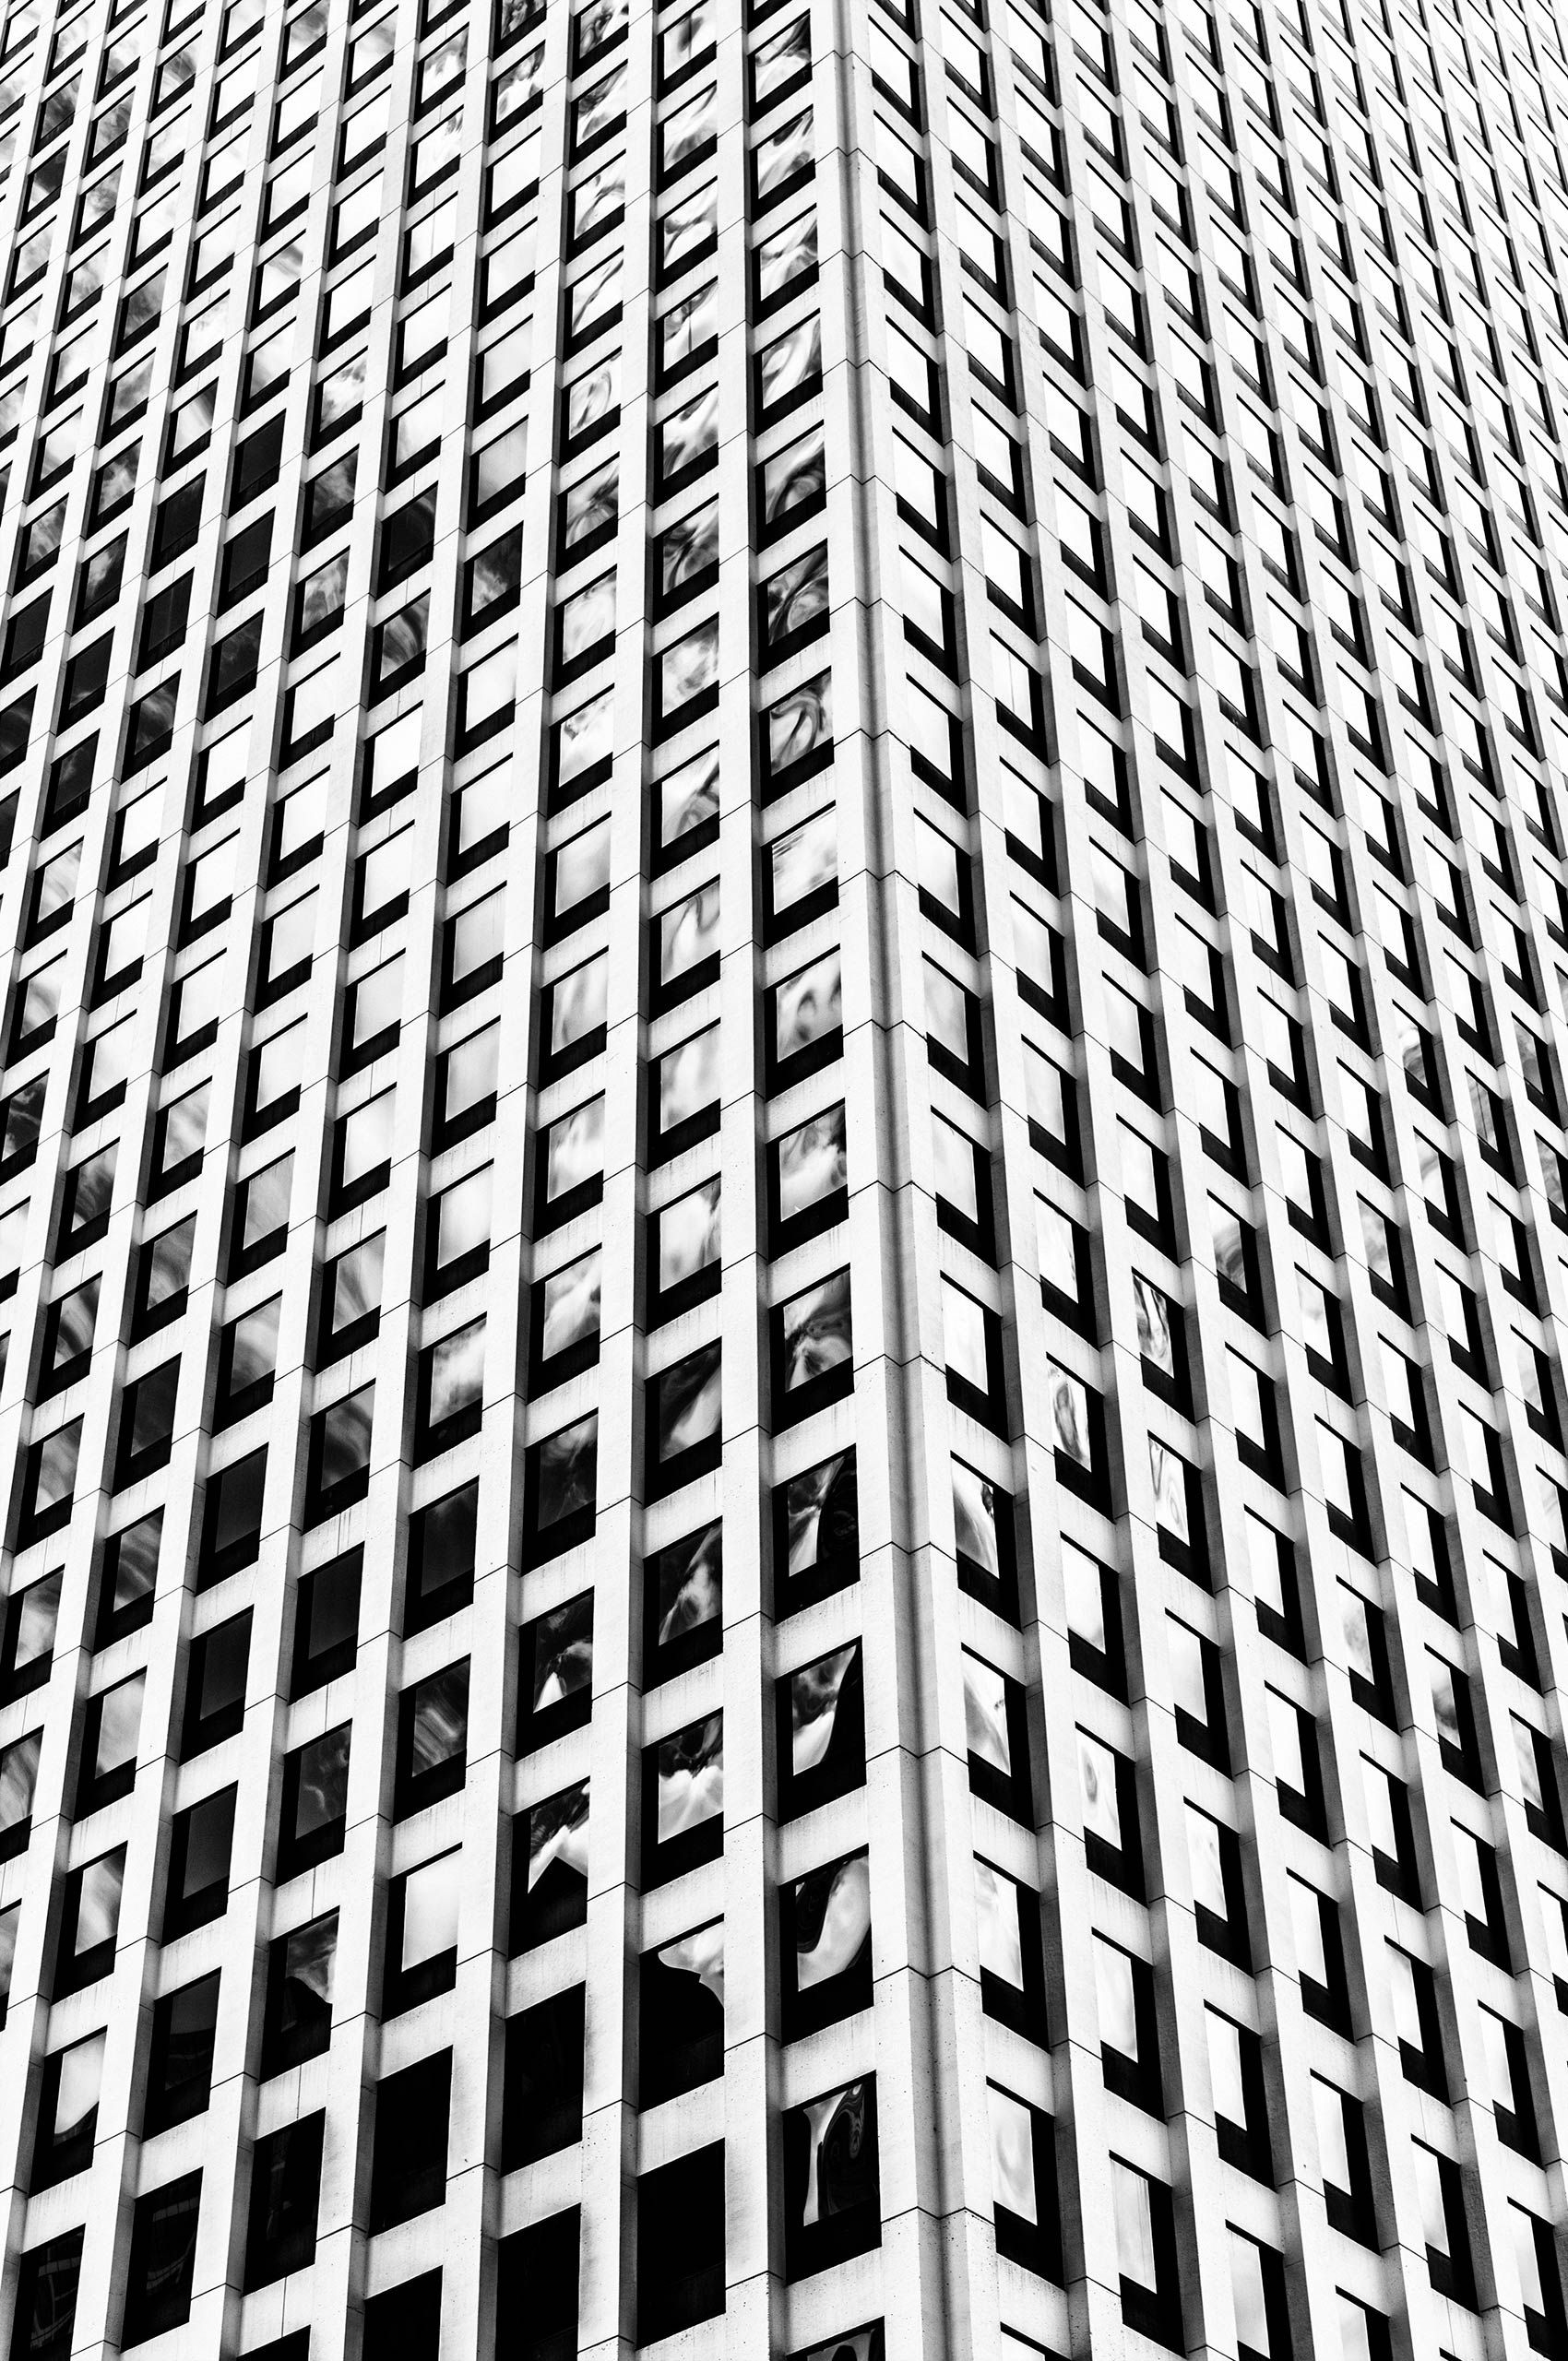 Buidling-facade-Chicago-HenrikOlundPhotography.jpg